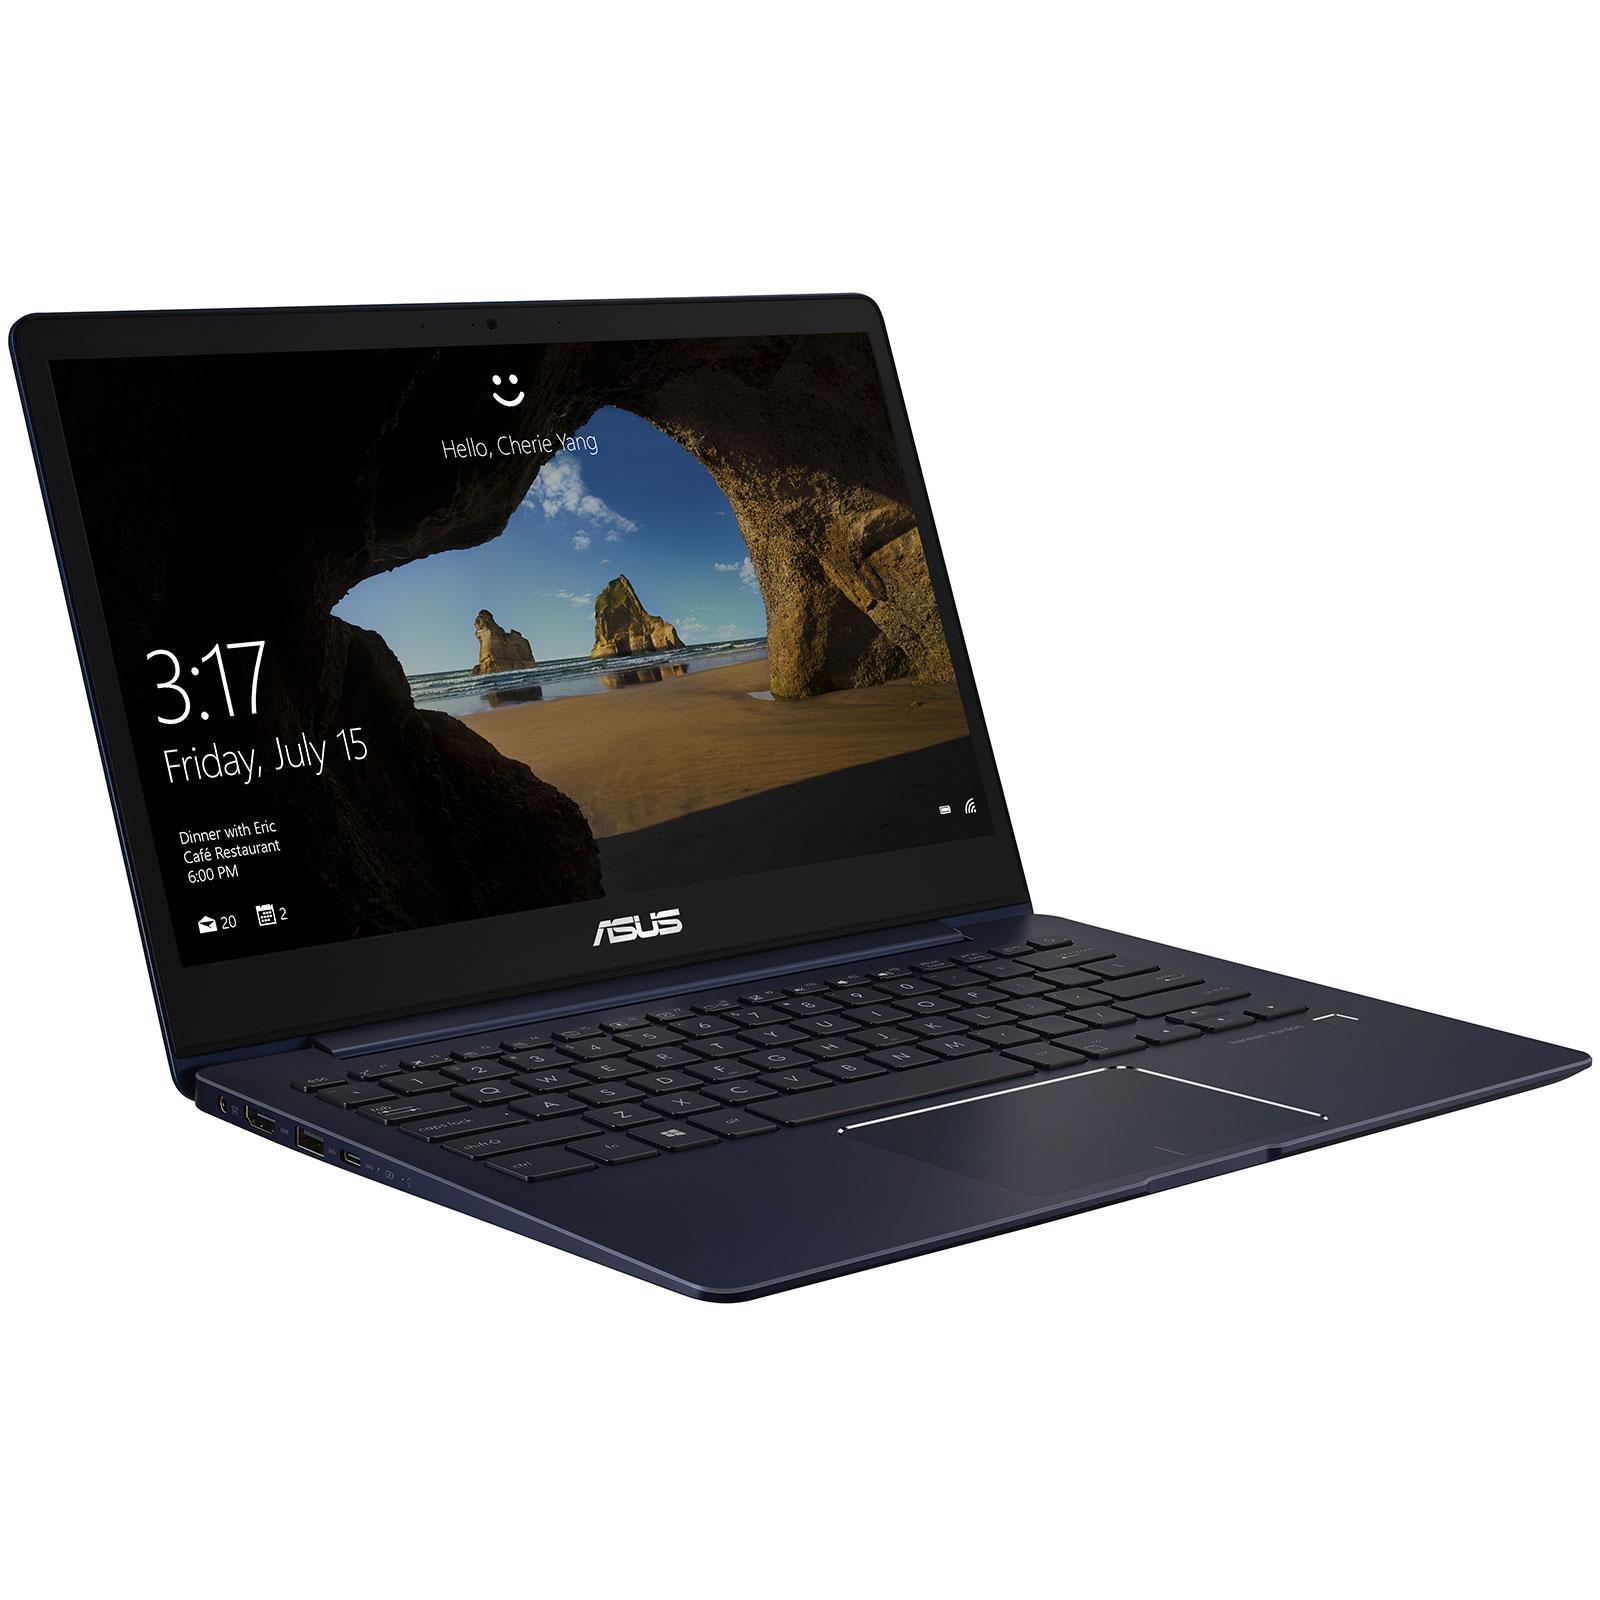 "PC portable ASUS Zenbook 13 UX331UA-EG007T Intel Core i5-8250U 8 Go SSD 512 Go 13.3"" LED Full HD Wi-Fi AC/Bluetooth Webcam Windows 10 Famille 64 bits (garantie constructeur 2 ans)"